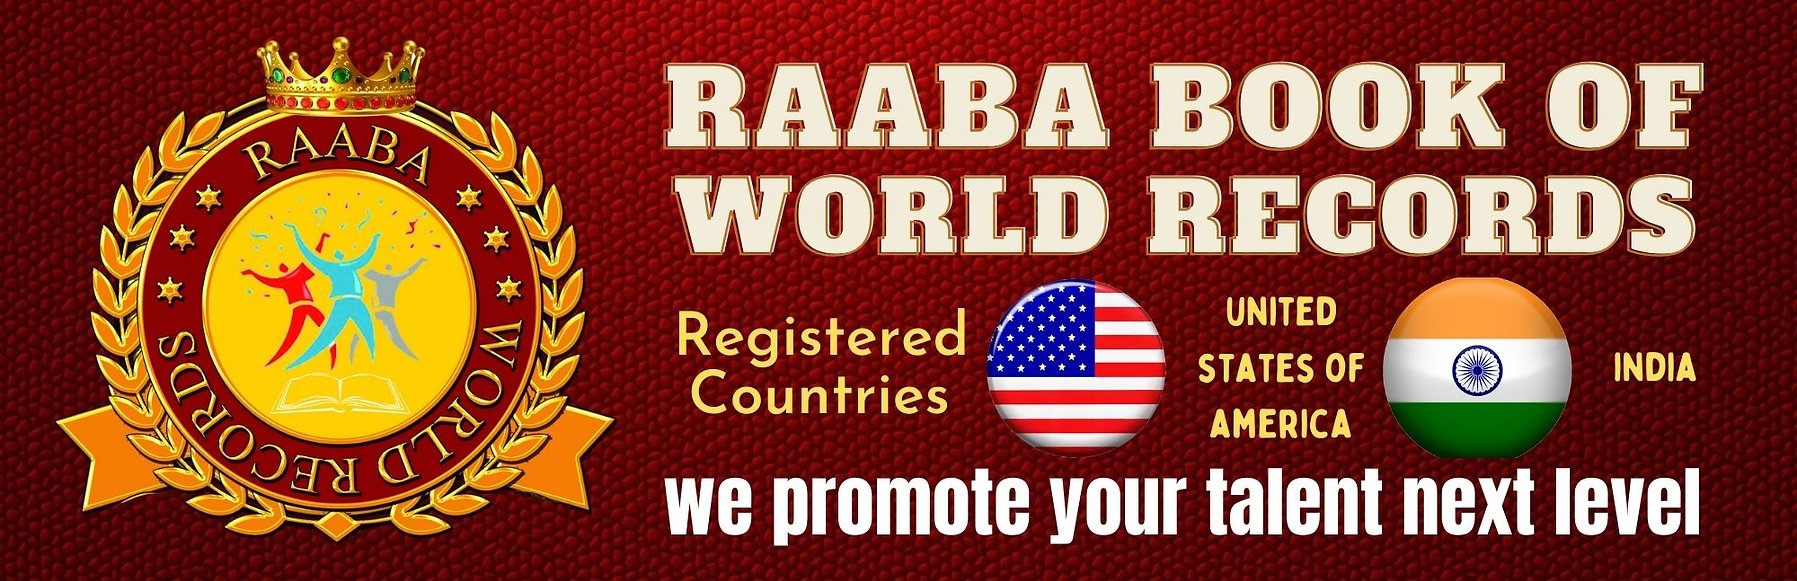 raaba book of world records 6.jpg